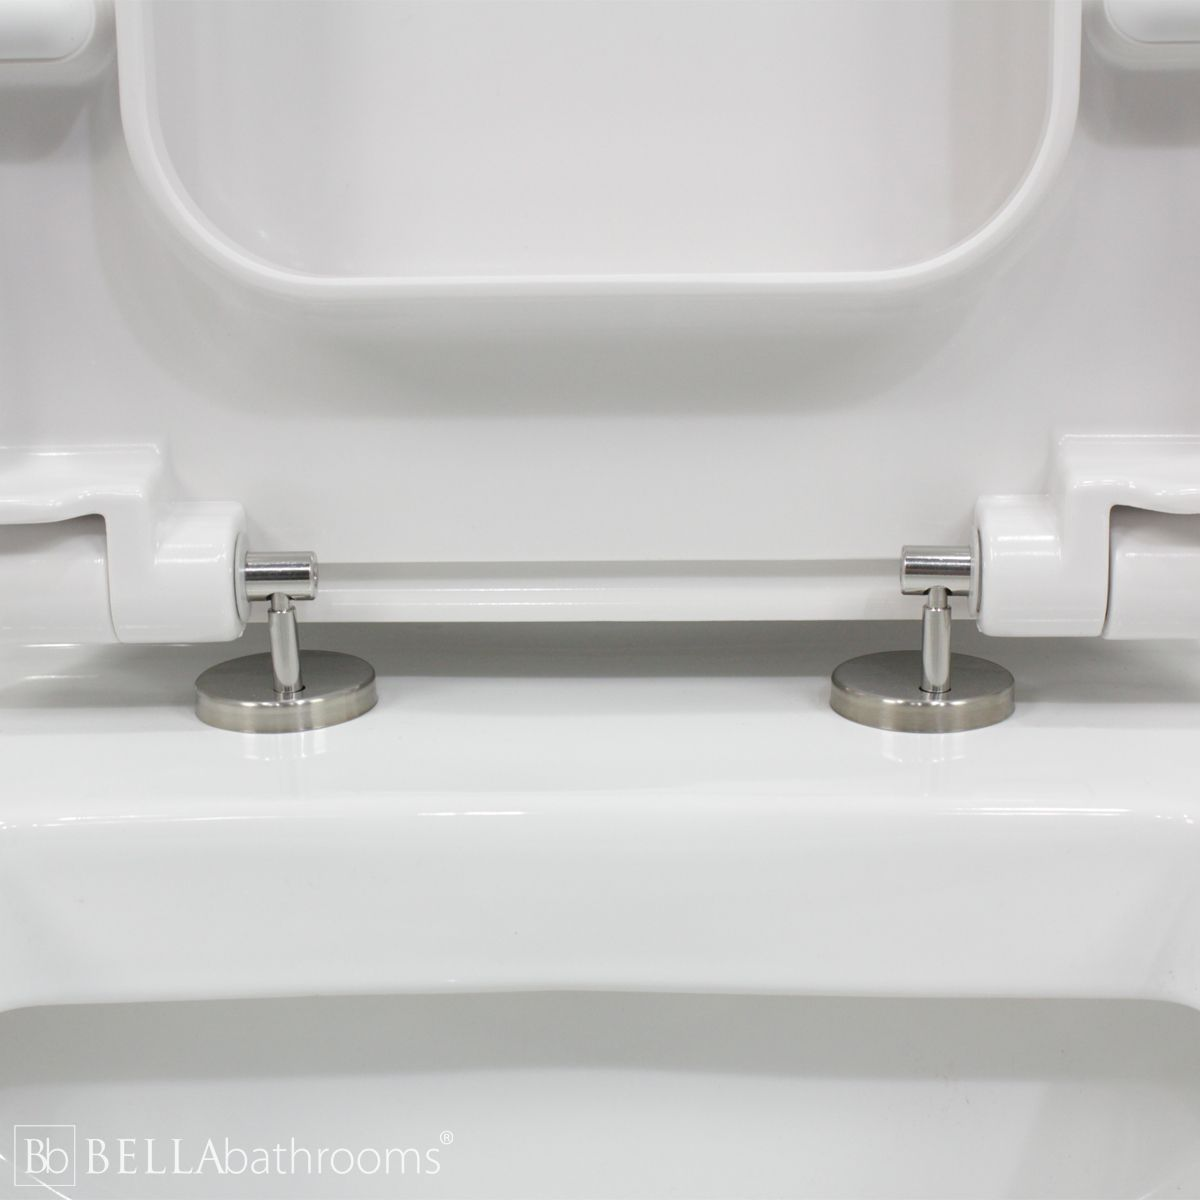 RAK Series 600 Standard Wrap Over Toilet Seat Hinges